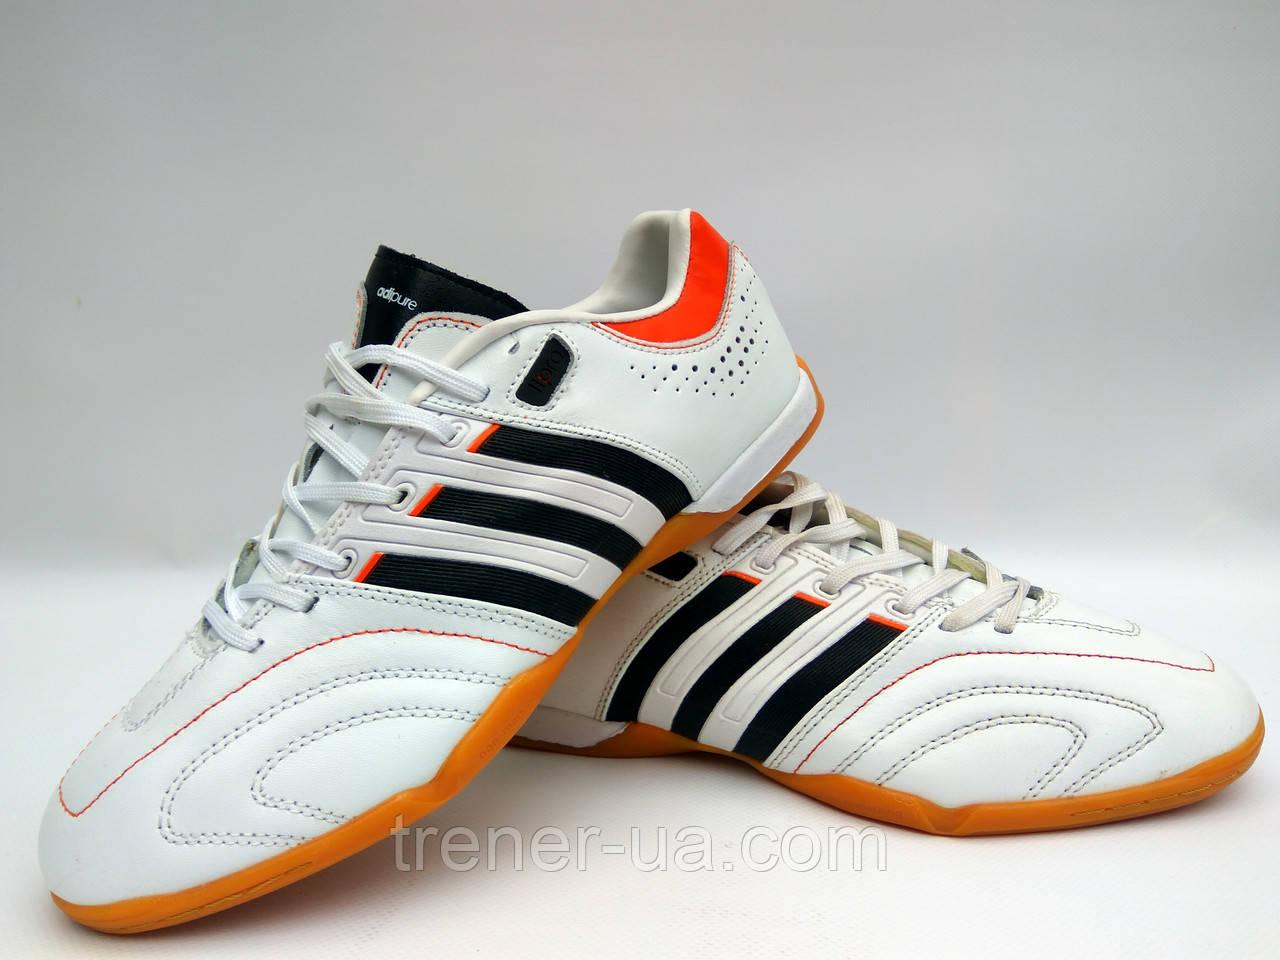 Футзальна взуття в стилі Adidas Adipure білий ART NO.909410